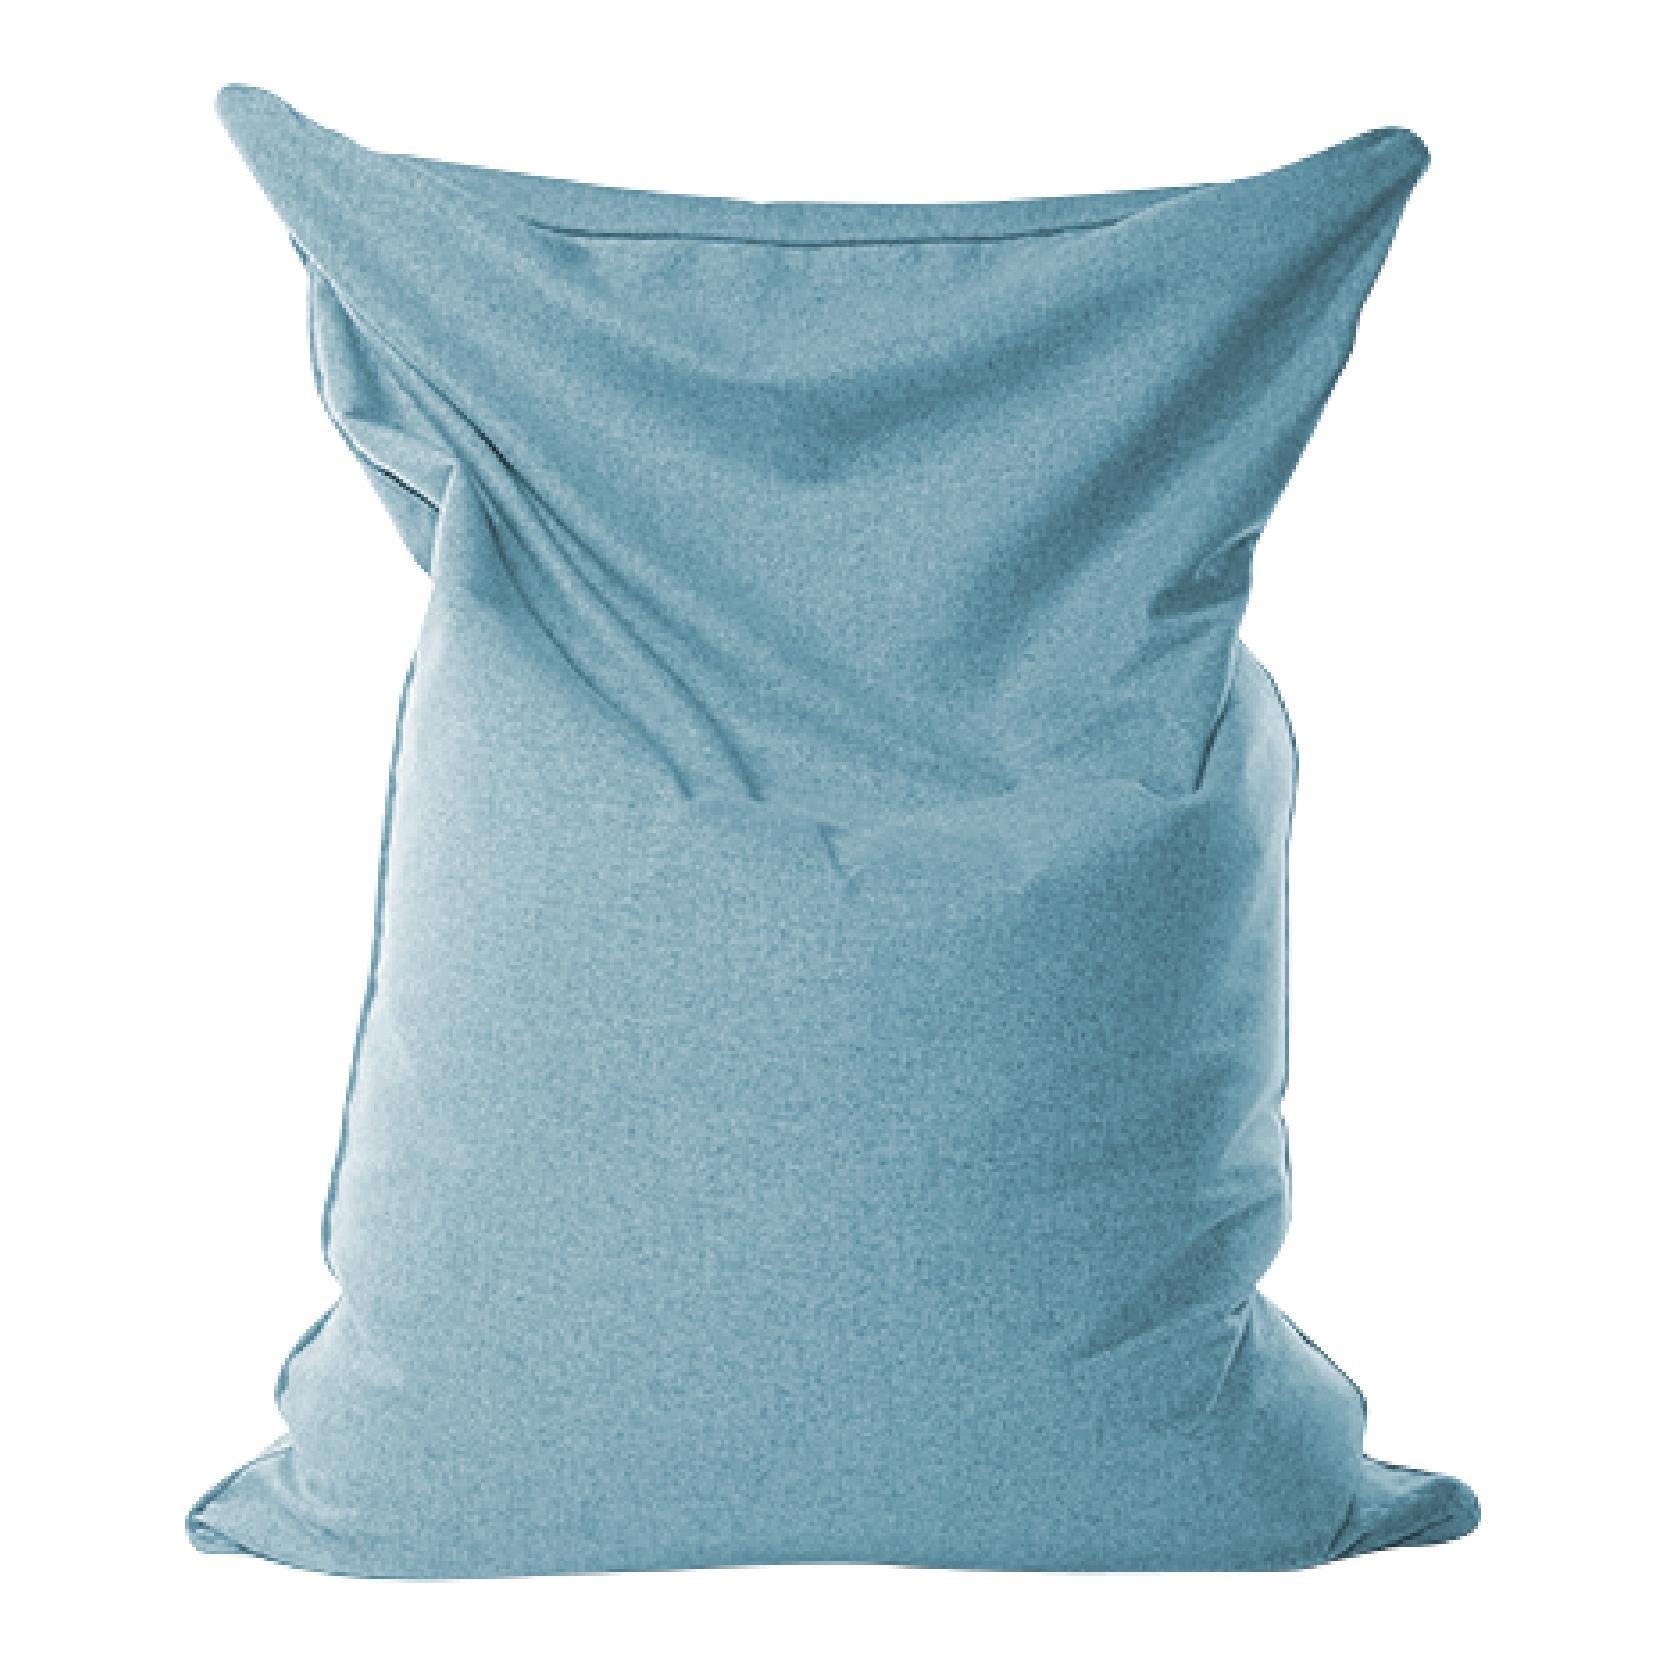 Jiji Tami Multi Purpose Bean Bag ( 130 X 160 Cm ) (bean Bag) - Beanbag/ Bean Bag Chair /styrofoam Particles Filled/ Fabric Outer Layer/ Washable / Small Sofa (sg) By Jiji.